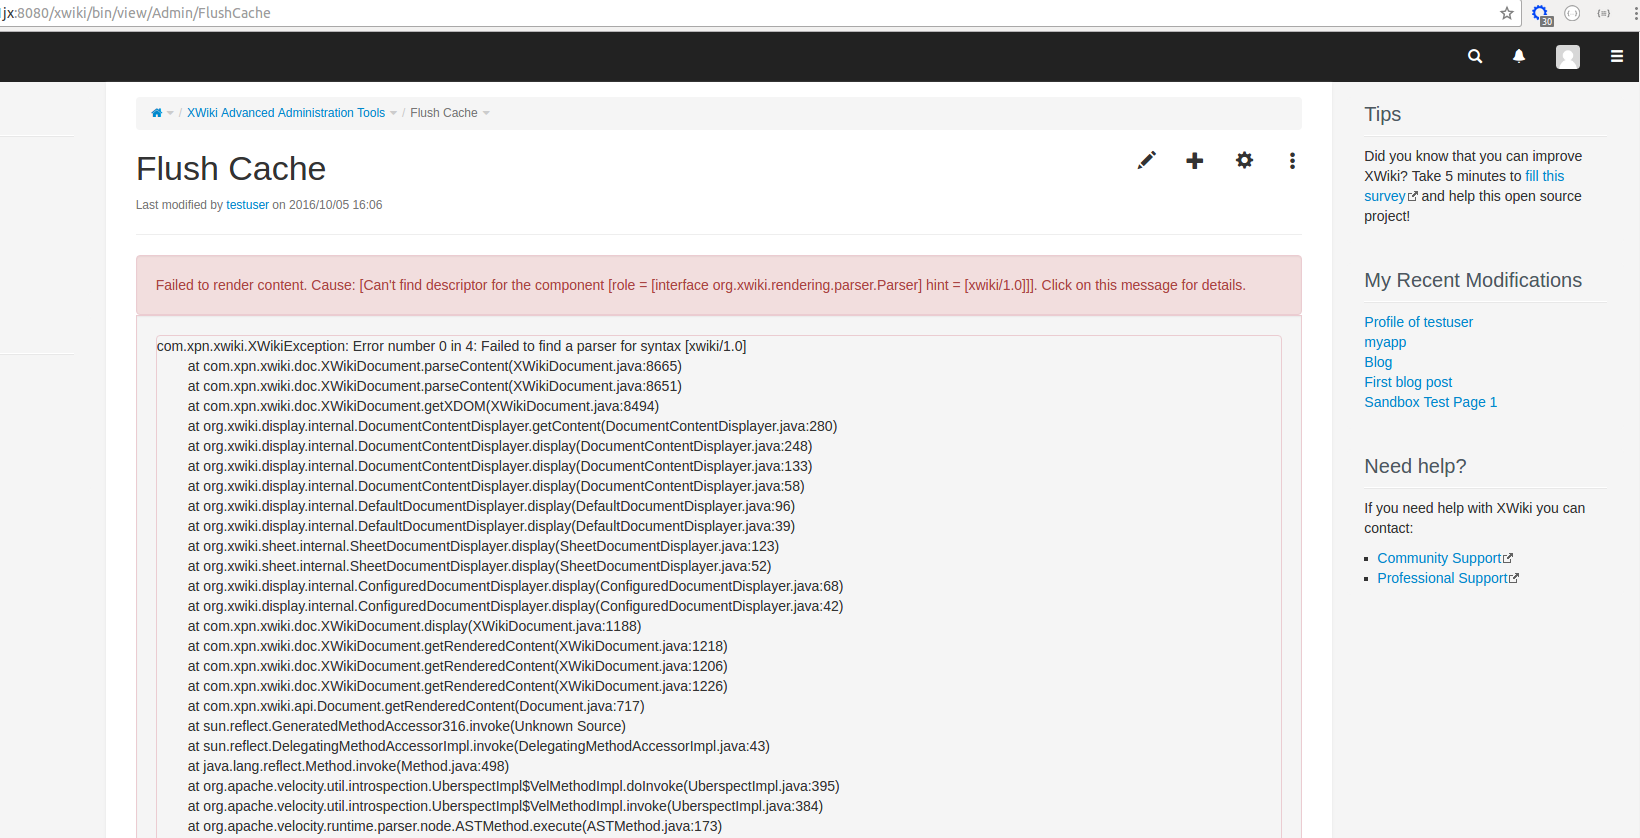 ADMINTOOL-45] Flush cache throws error regarding XWiki syntax